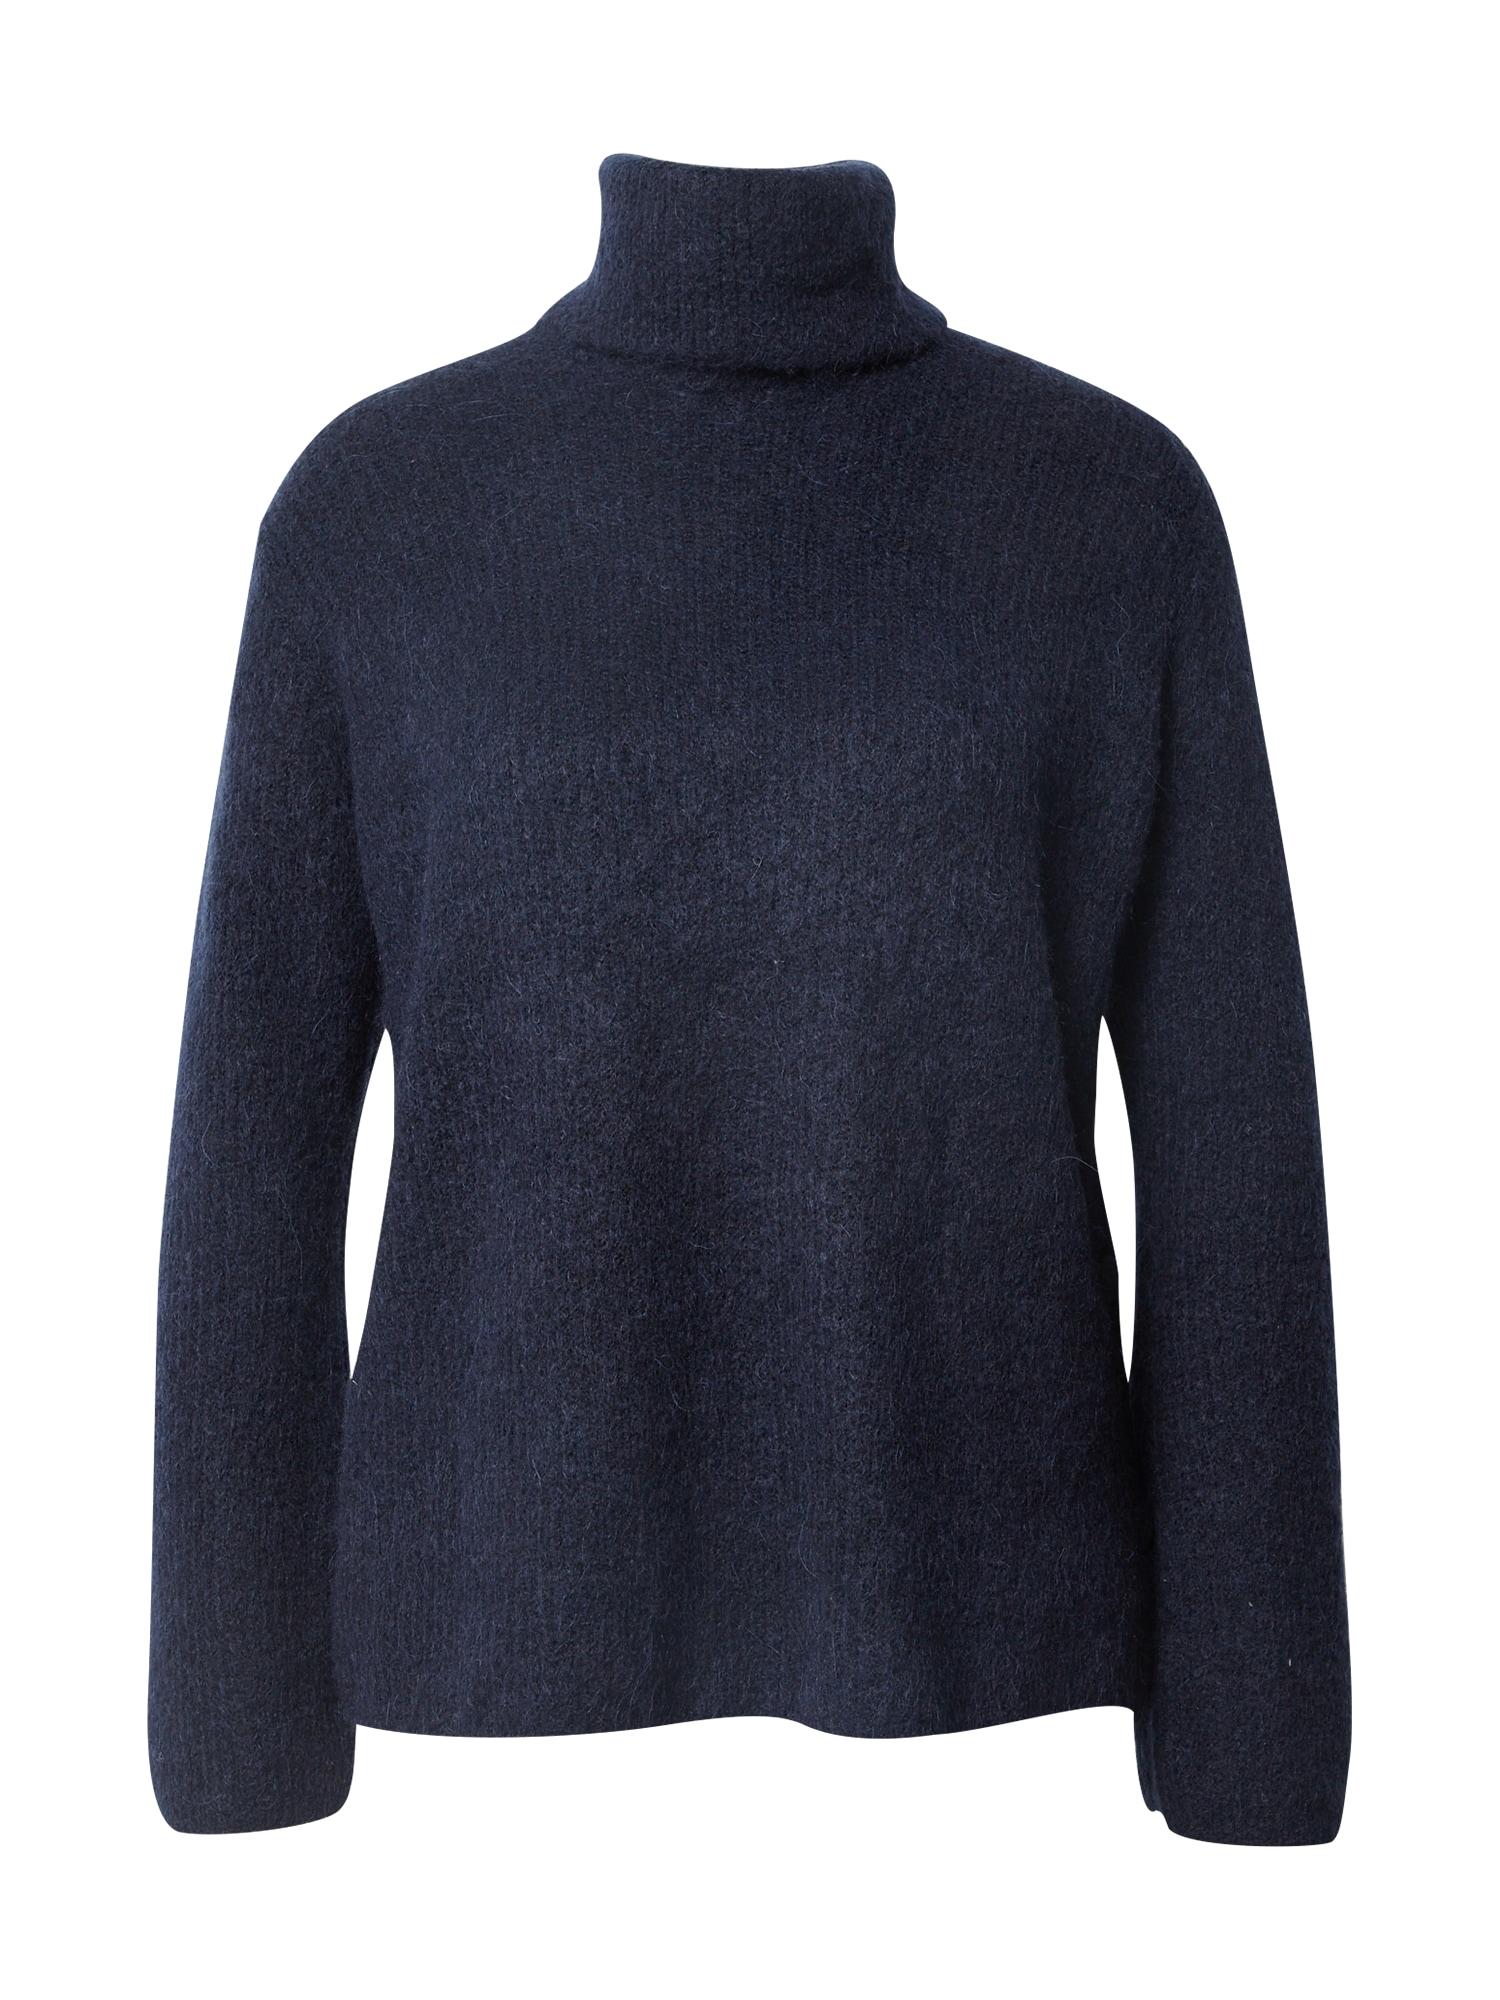 Y.A.S Megztinis tamsiai mėlyna